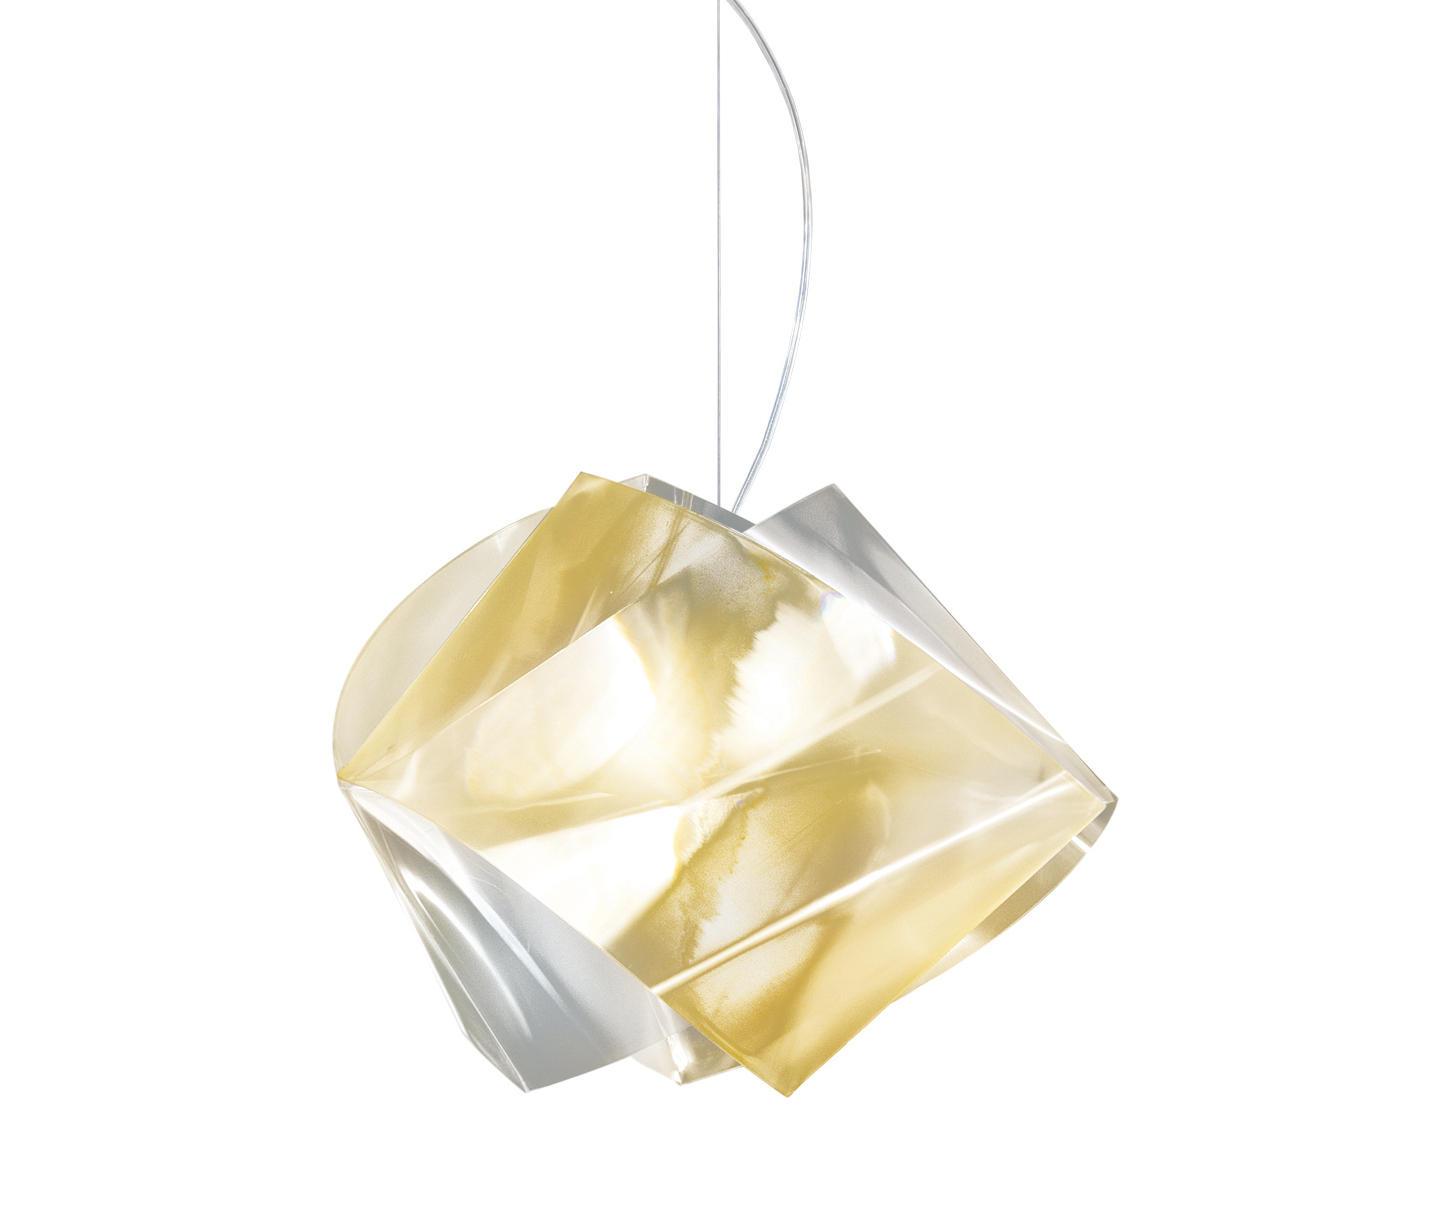 gemmy prisma color suspension general lighting from slamp architonic. Black Bedroom Furniture Sets. Home Design Ideas